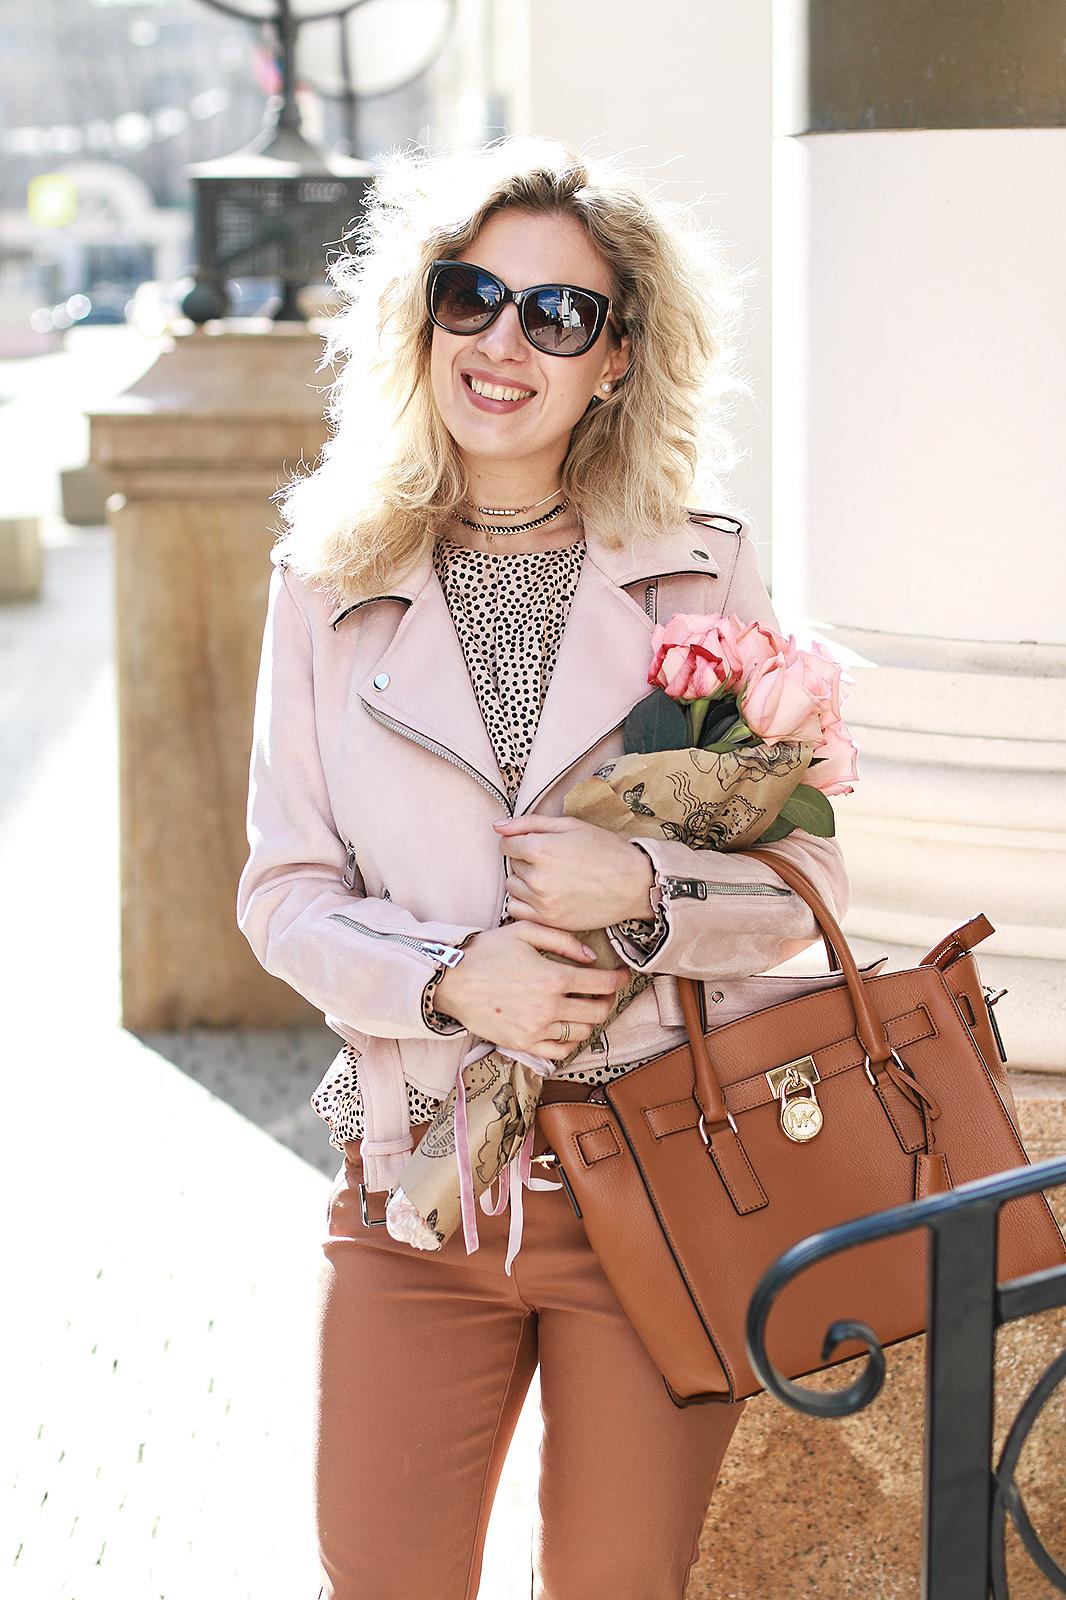 Margarita_Maslova_Ritalifestyle_Fashion_blogger_Moscow_MK_bag_portal_shoes_Zara_pink_jacket_